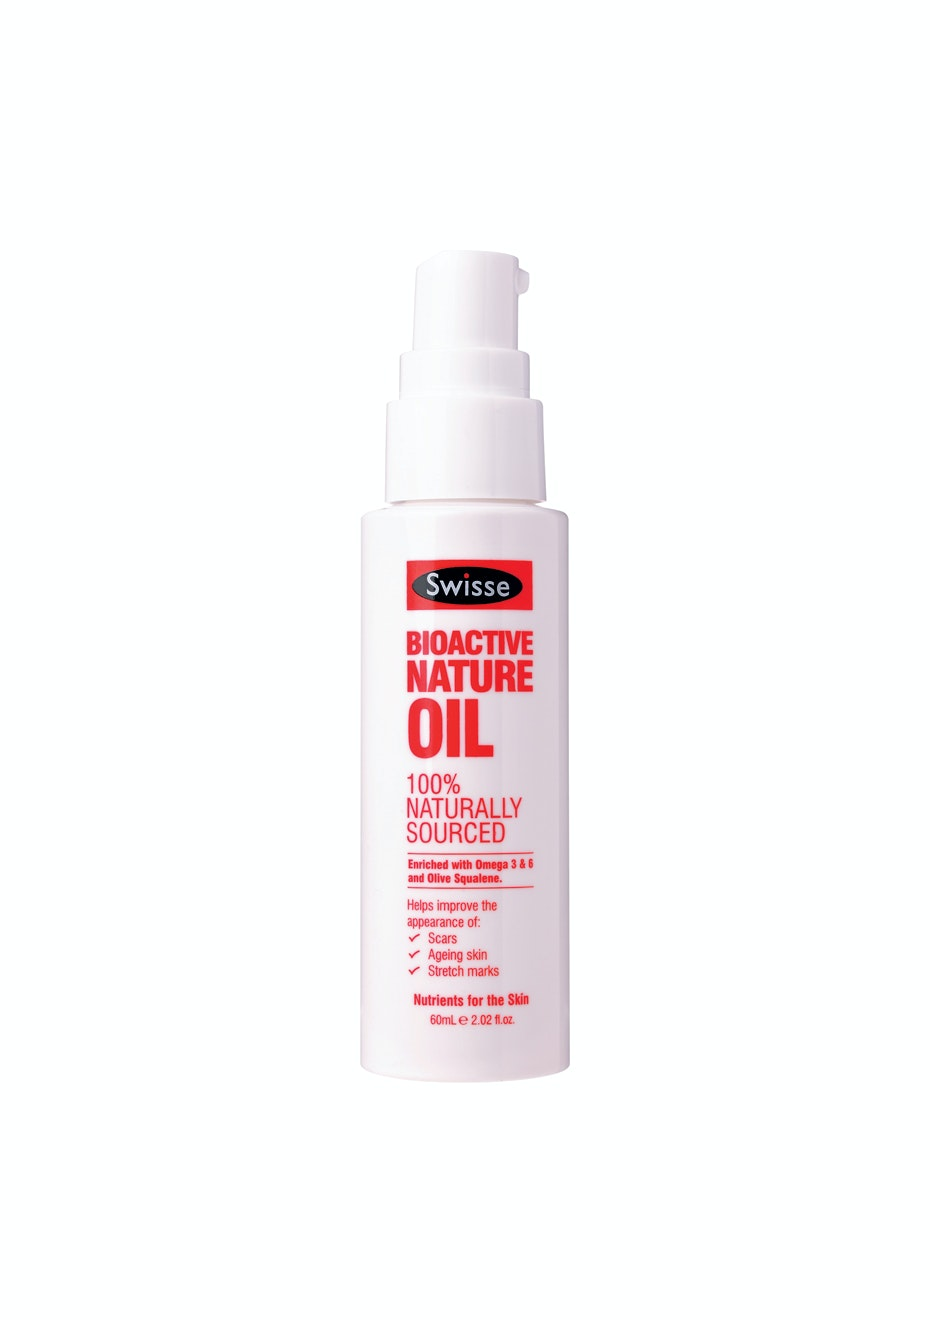 Swisse Bio Active Nature Oil 60Ml